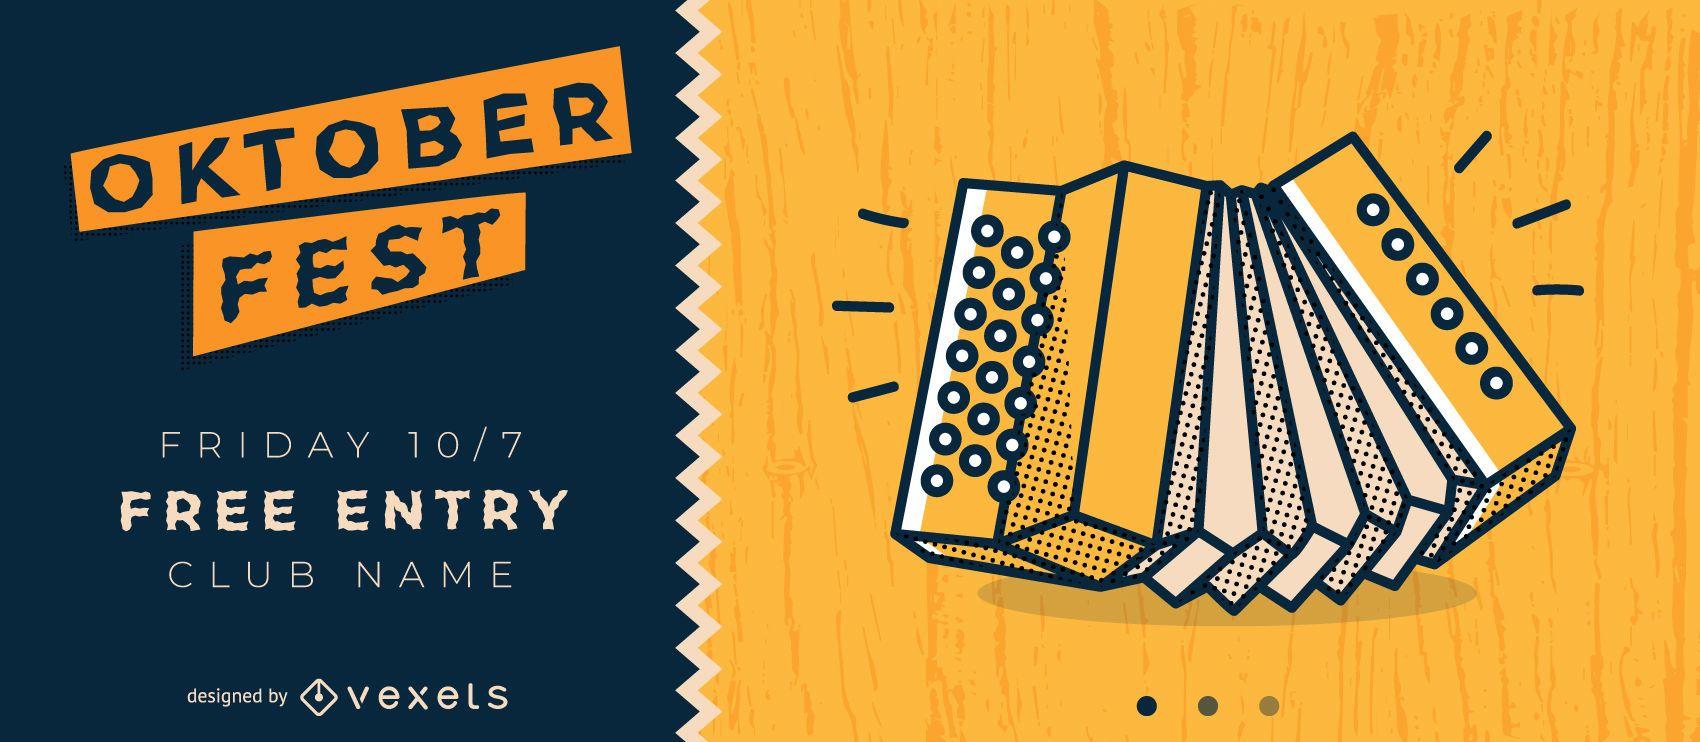 Oktoberfest Party Invitation Vector Design